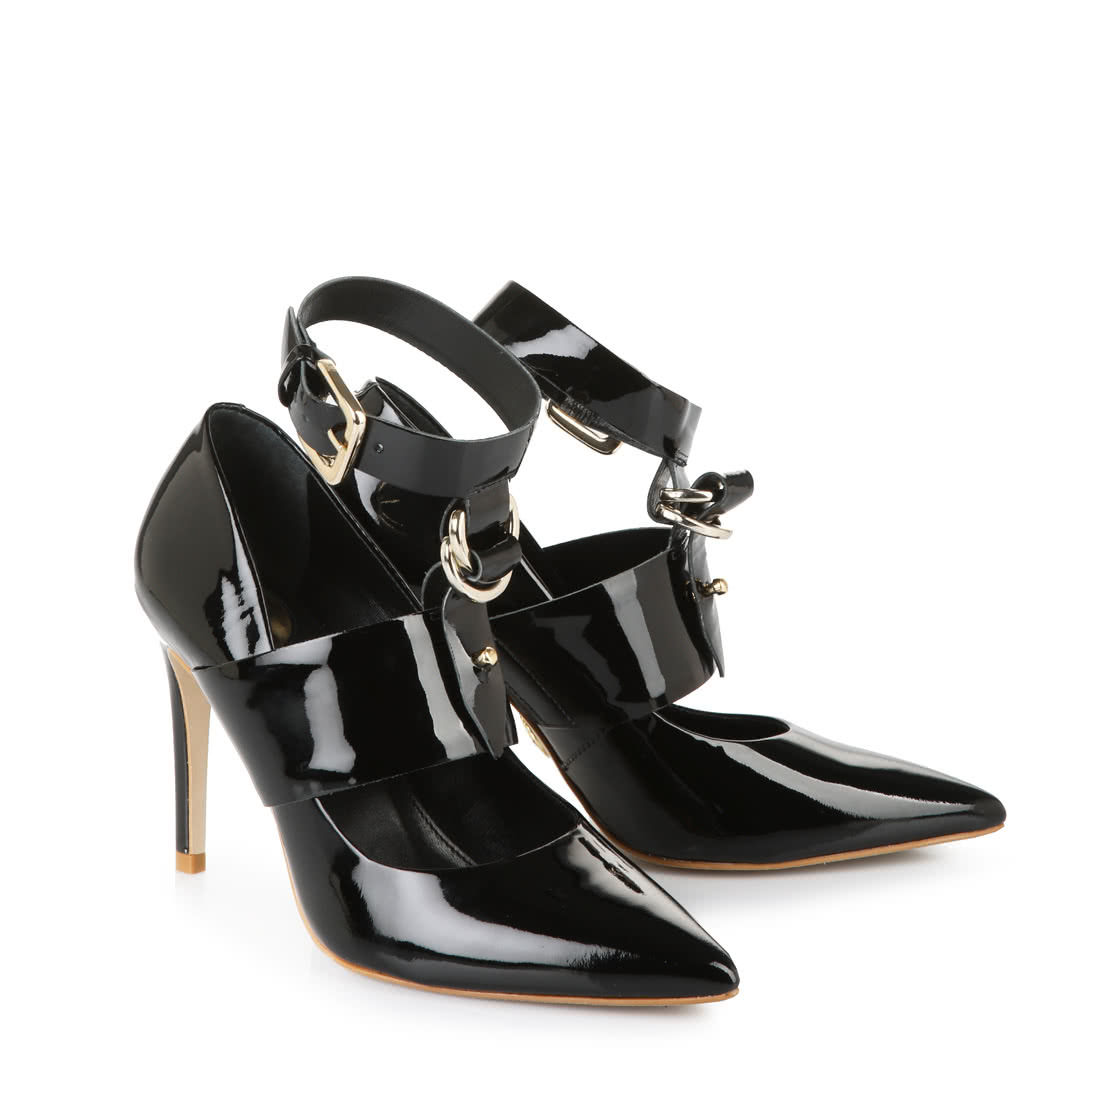 Bridal Shoes Low Heel